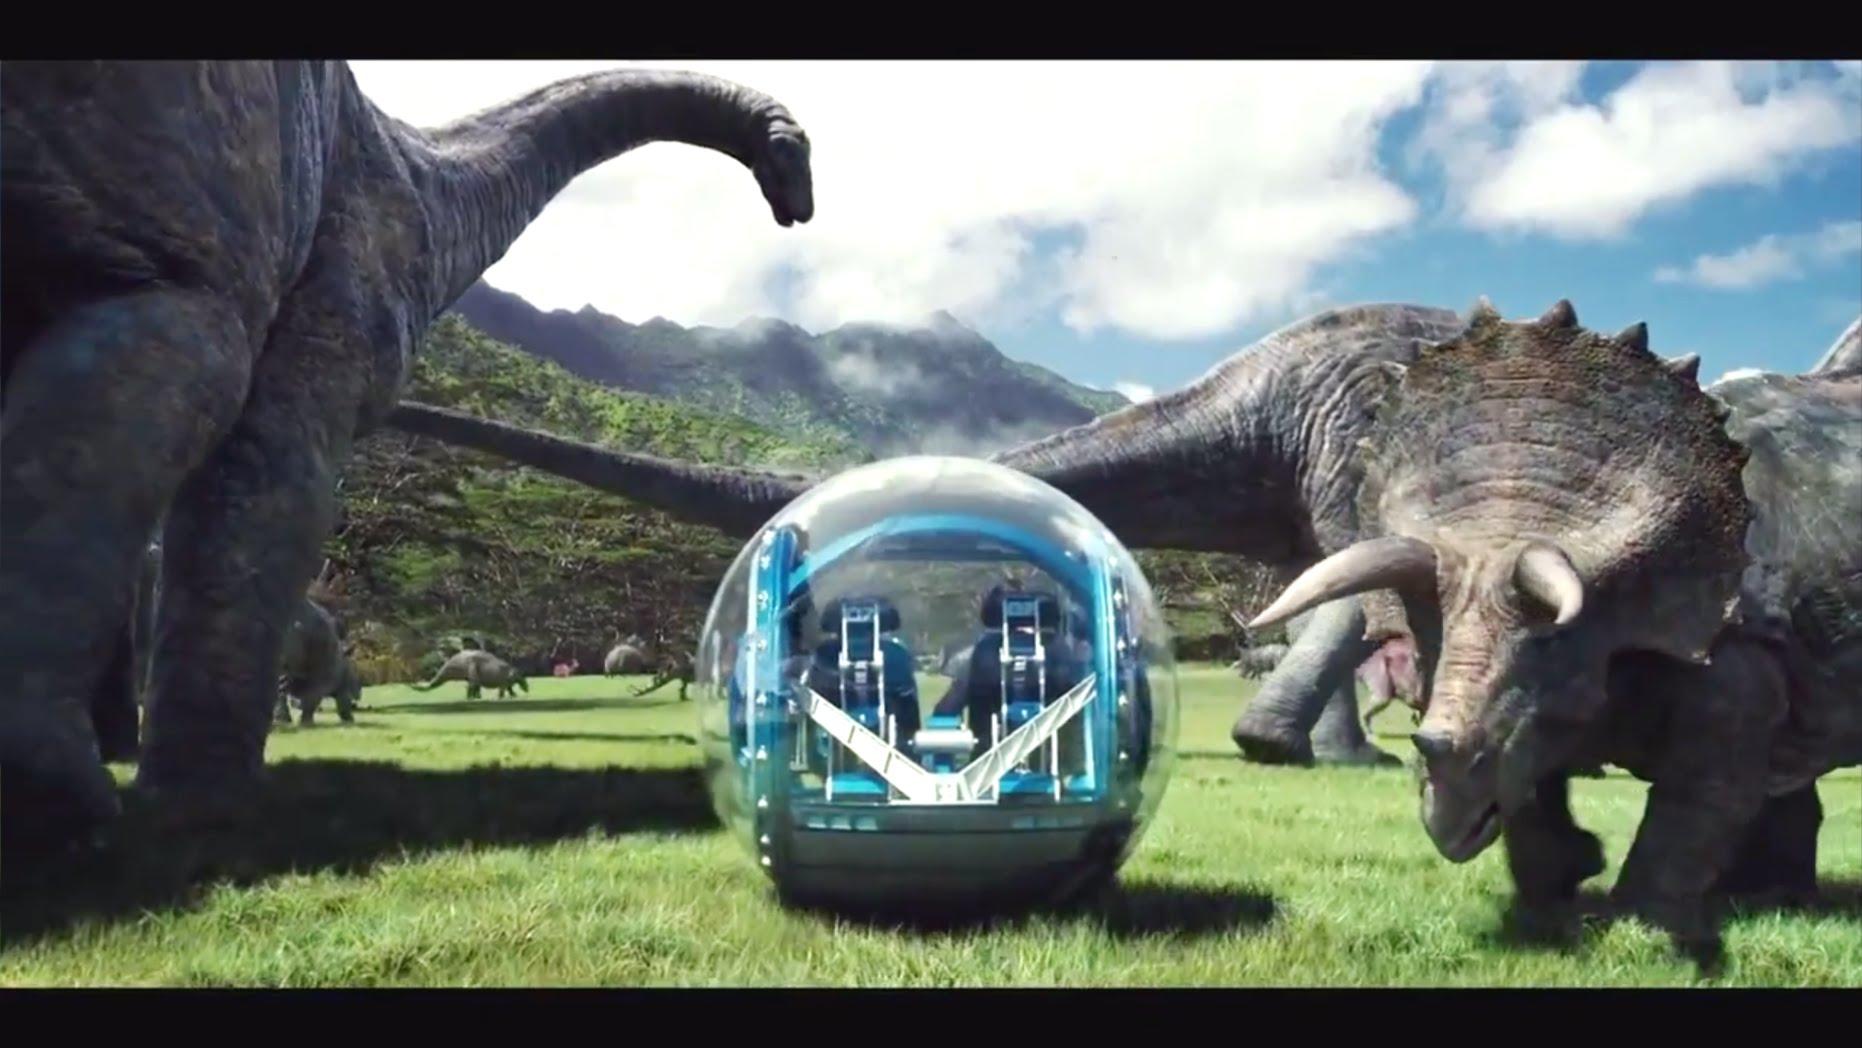 3d Wallpaper Gyro Jurassic World Youthmagazine